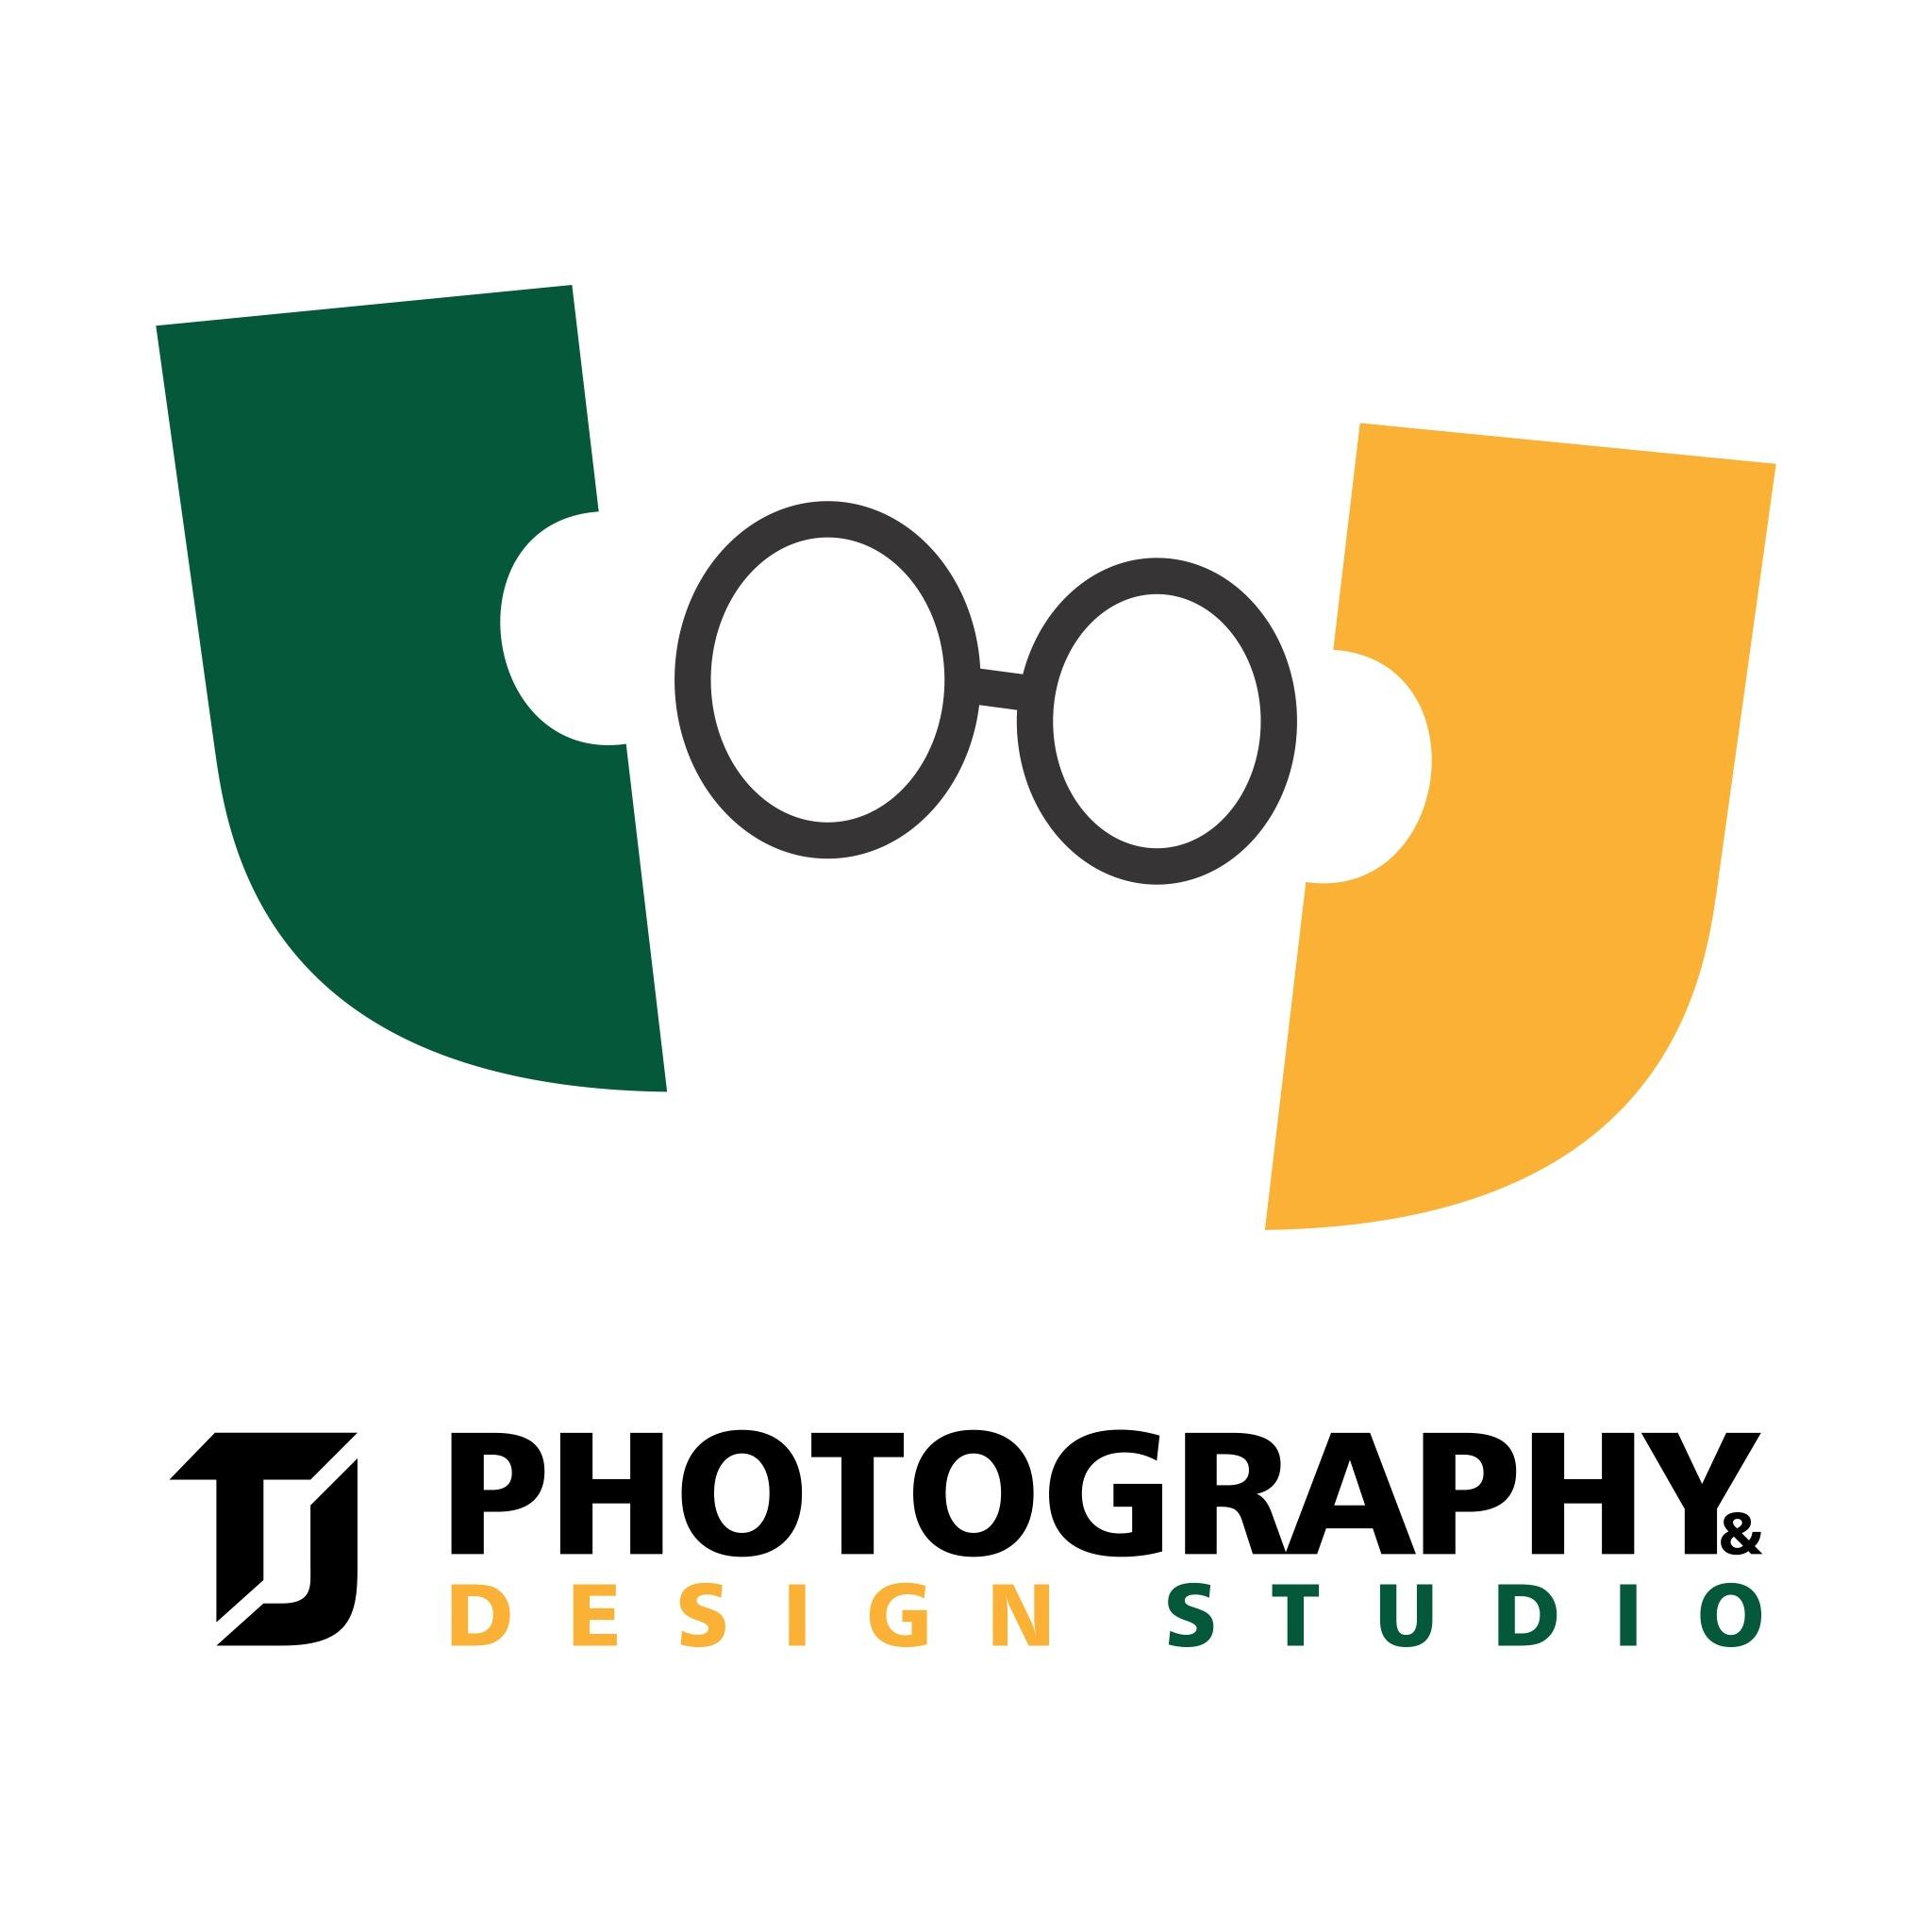 T J Photography and Design Studio